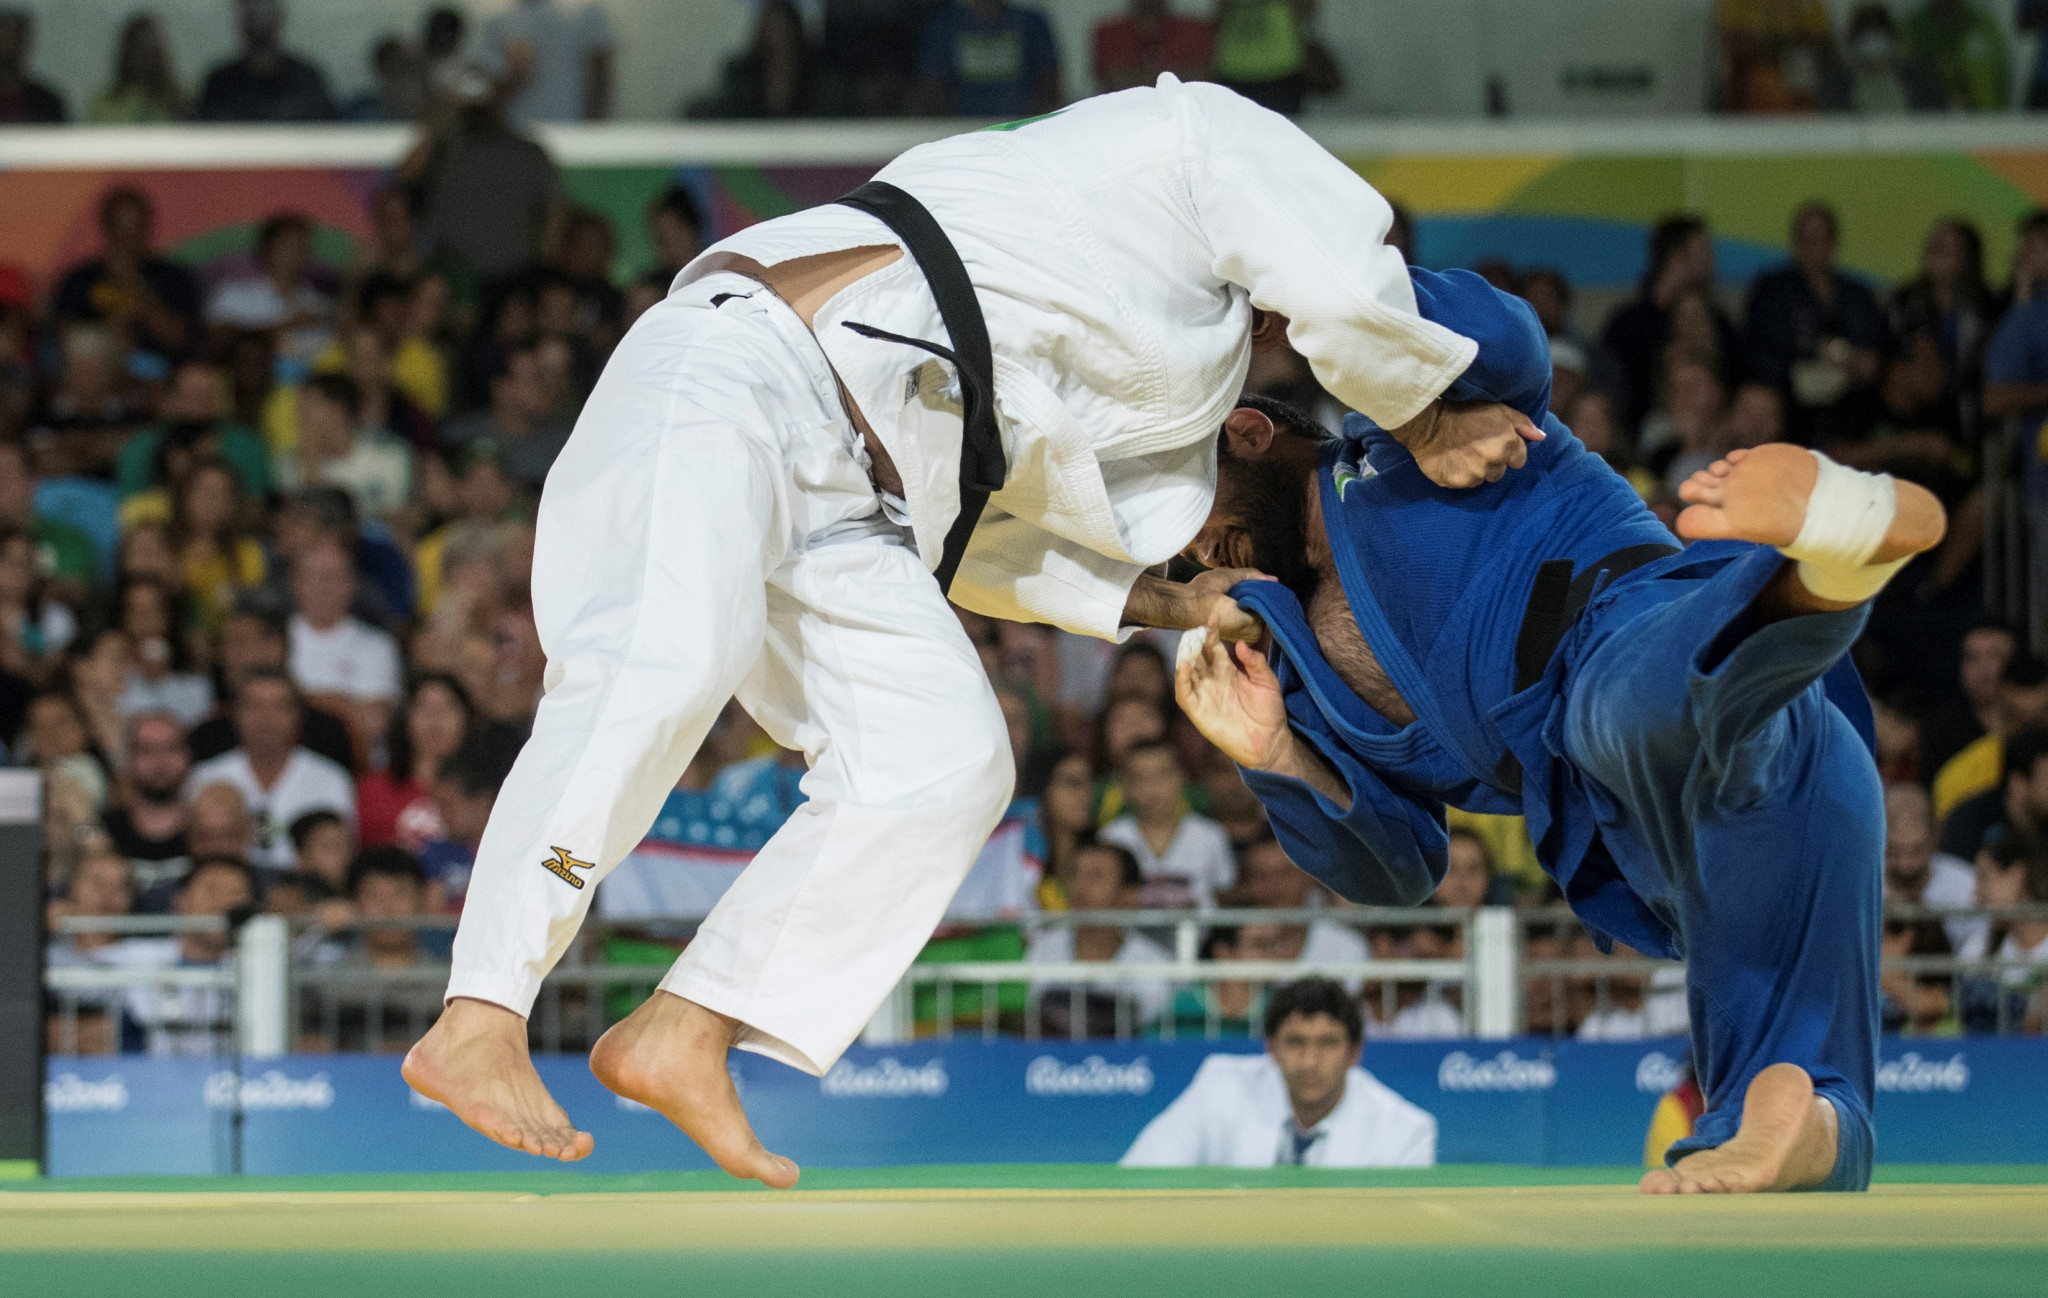 Brazil and Uzbekistan earn two golds each on final day of IBSA Judo Grand Prix in Baku